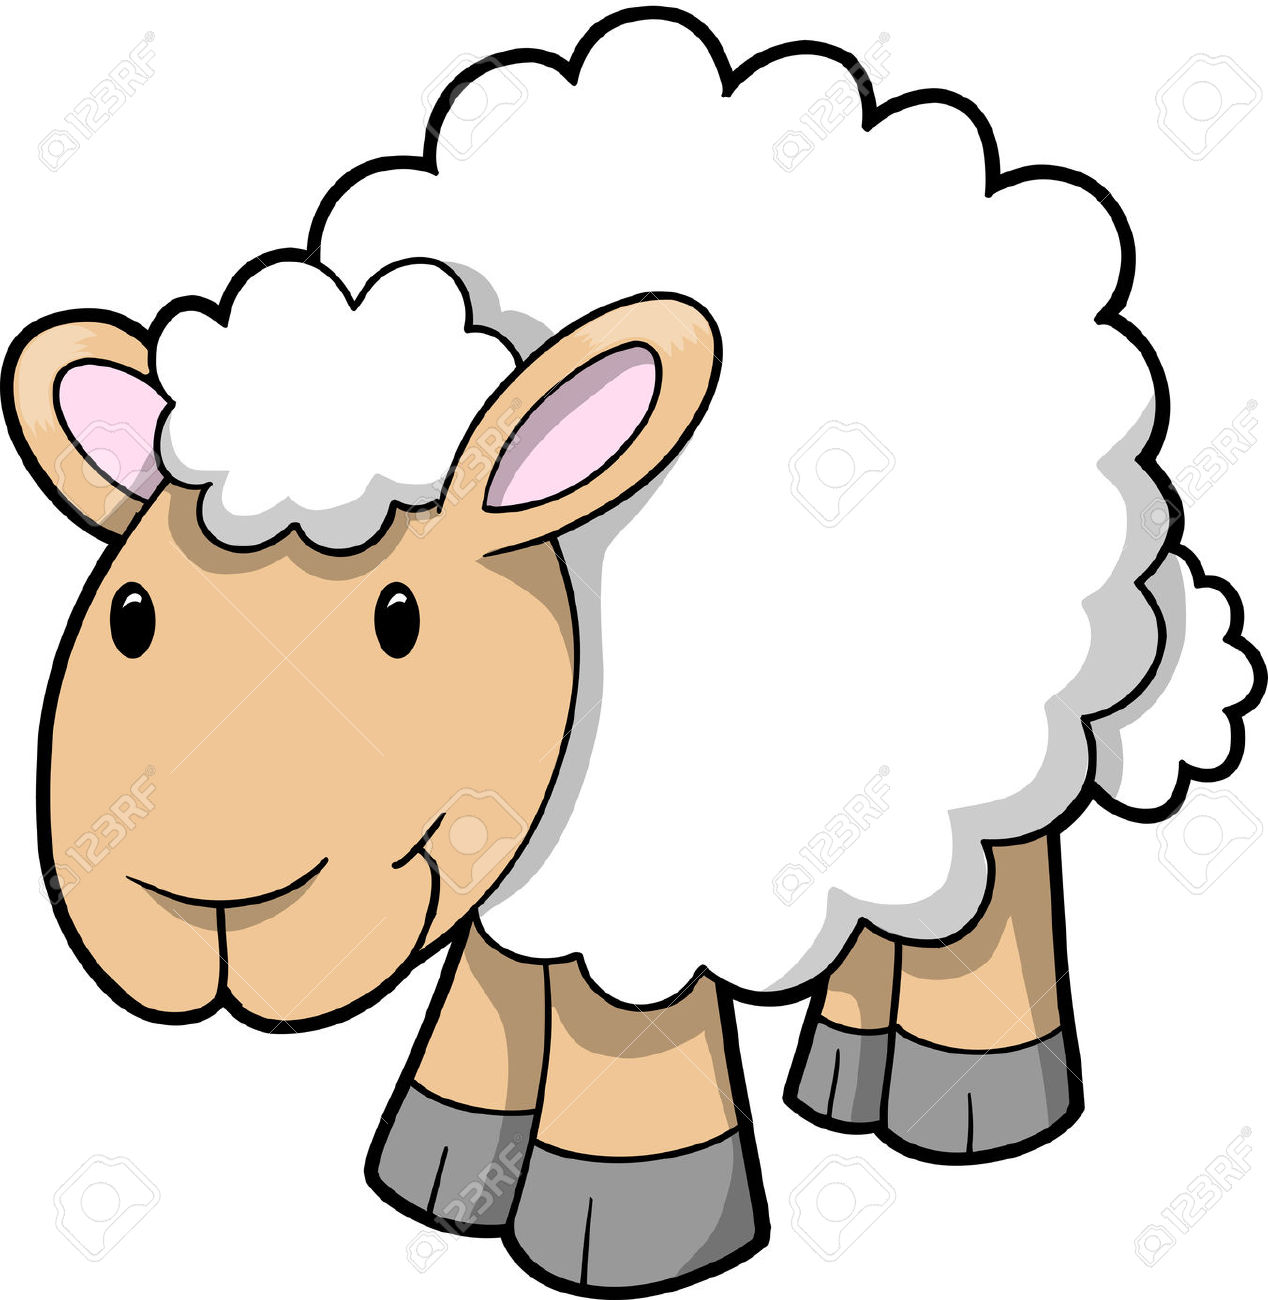 pin Sheep clipart cartoon #1